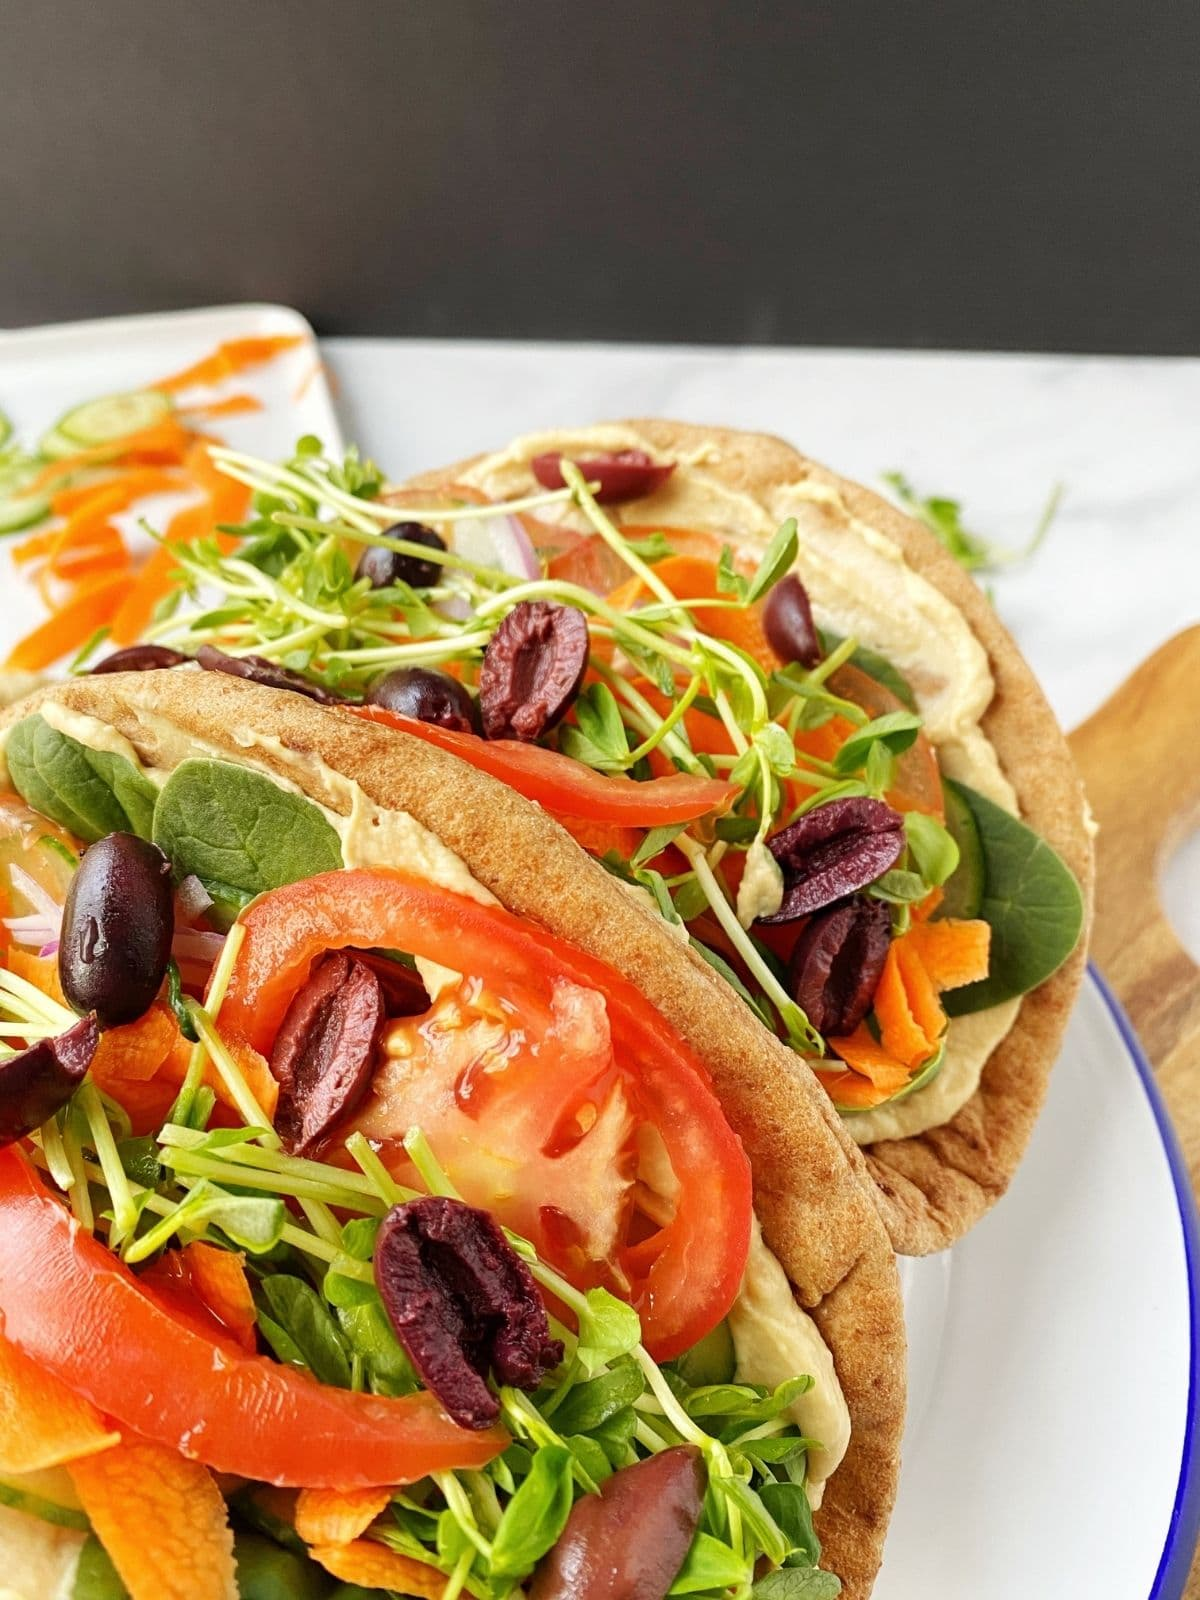 close up of veggies and hummus stuffed pita bread